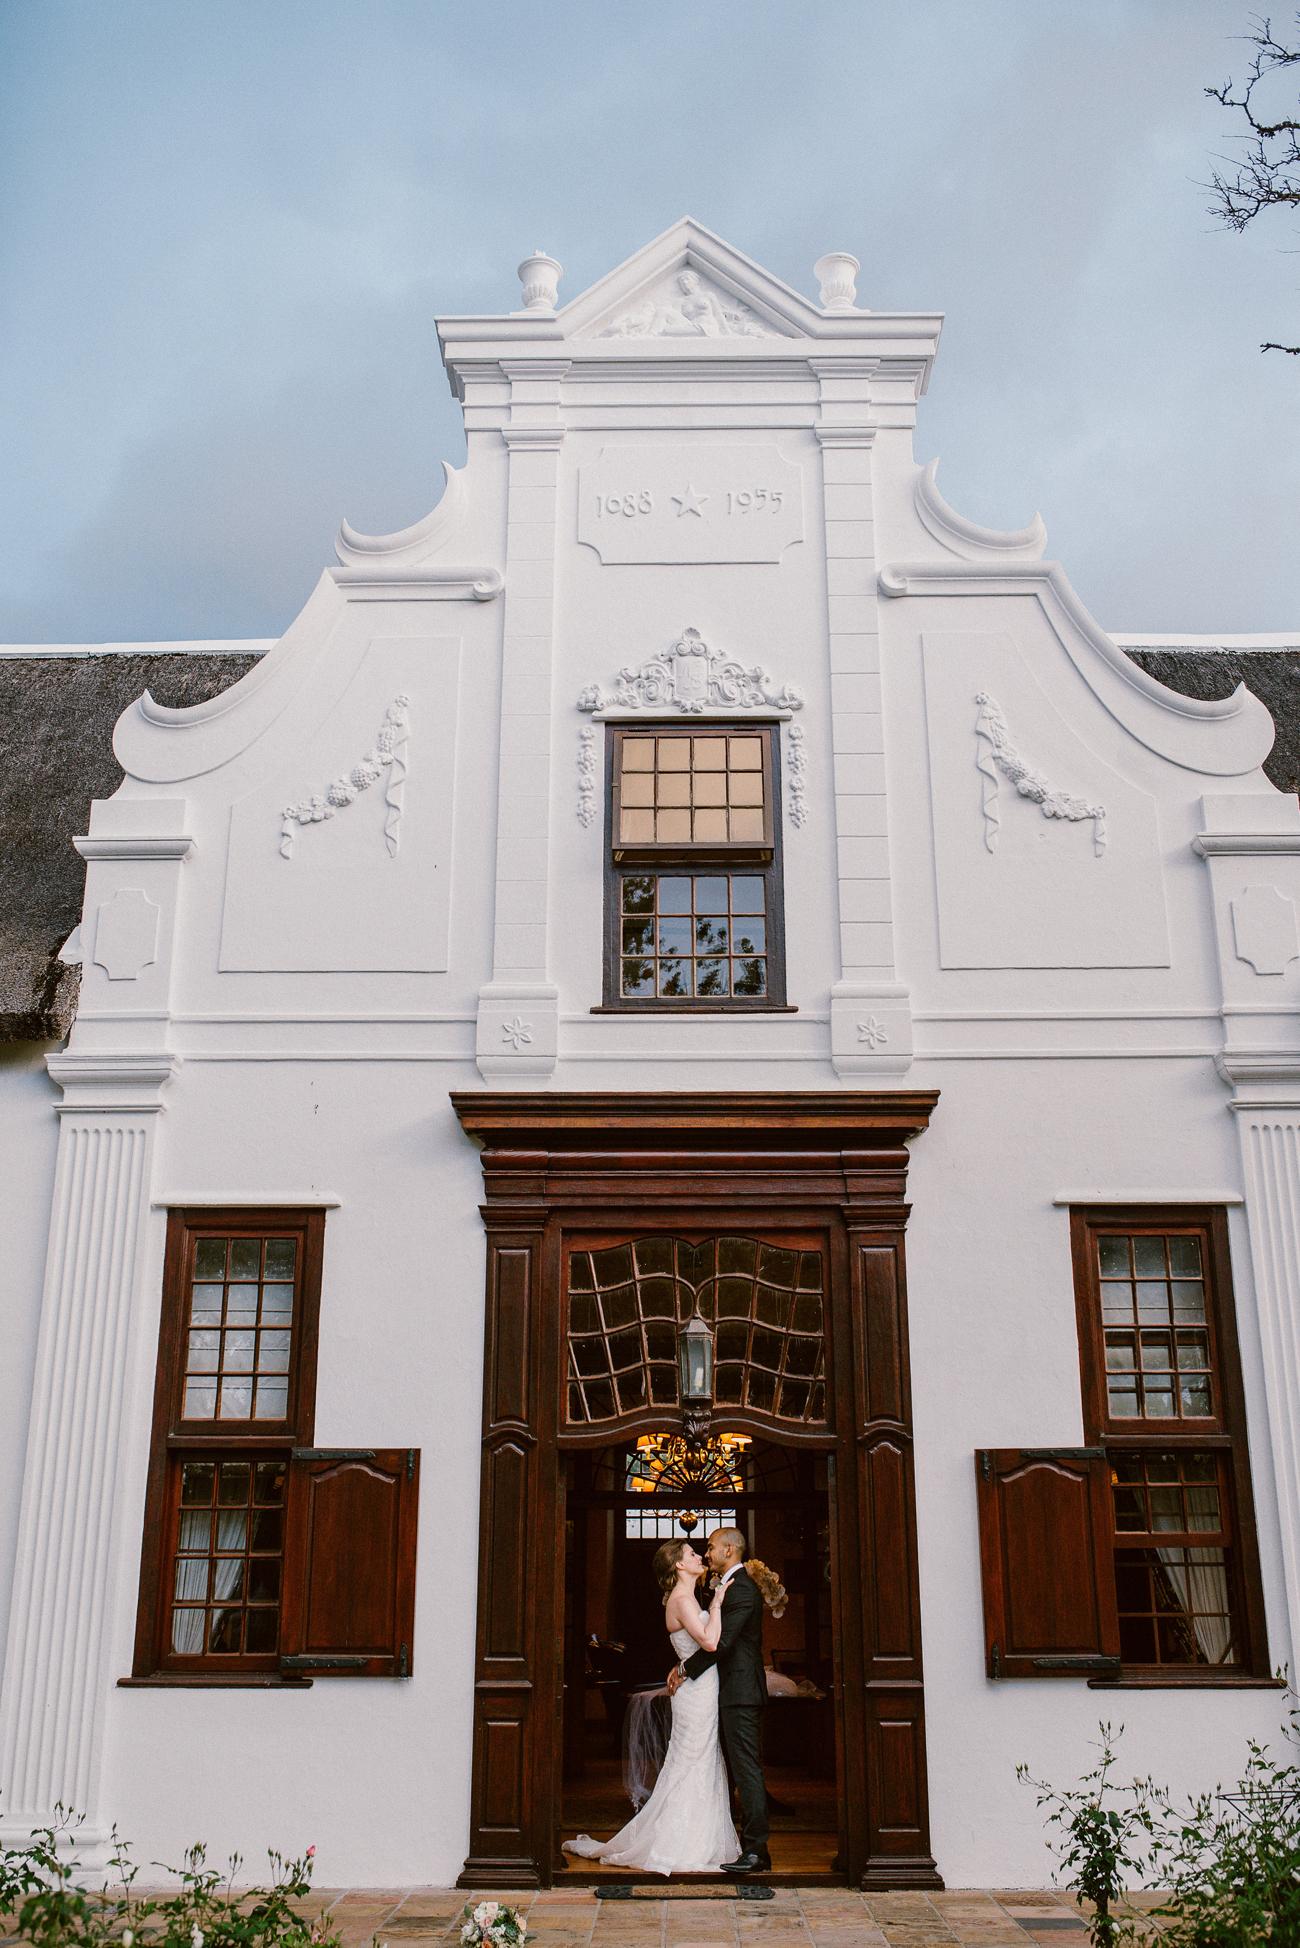 Cape Dutch Manor House Wedding | Image: Lad & Lass Photography